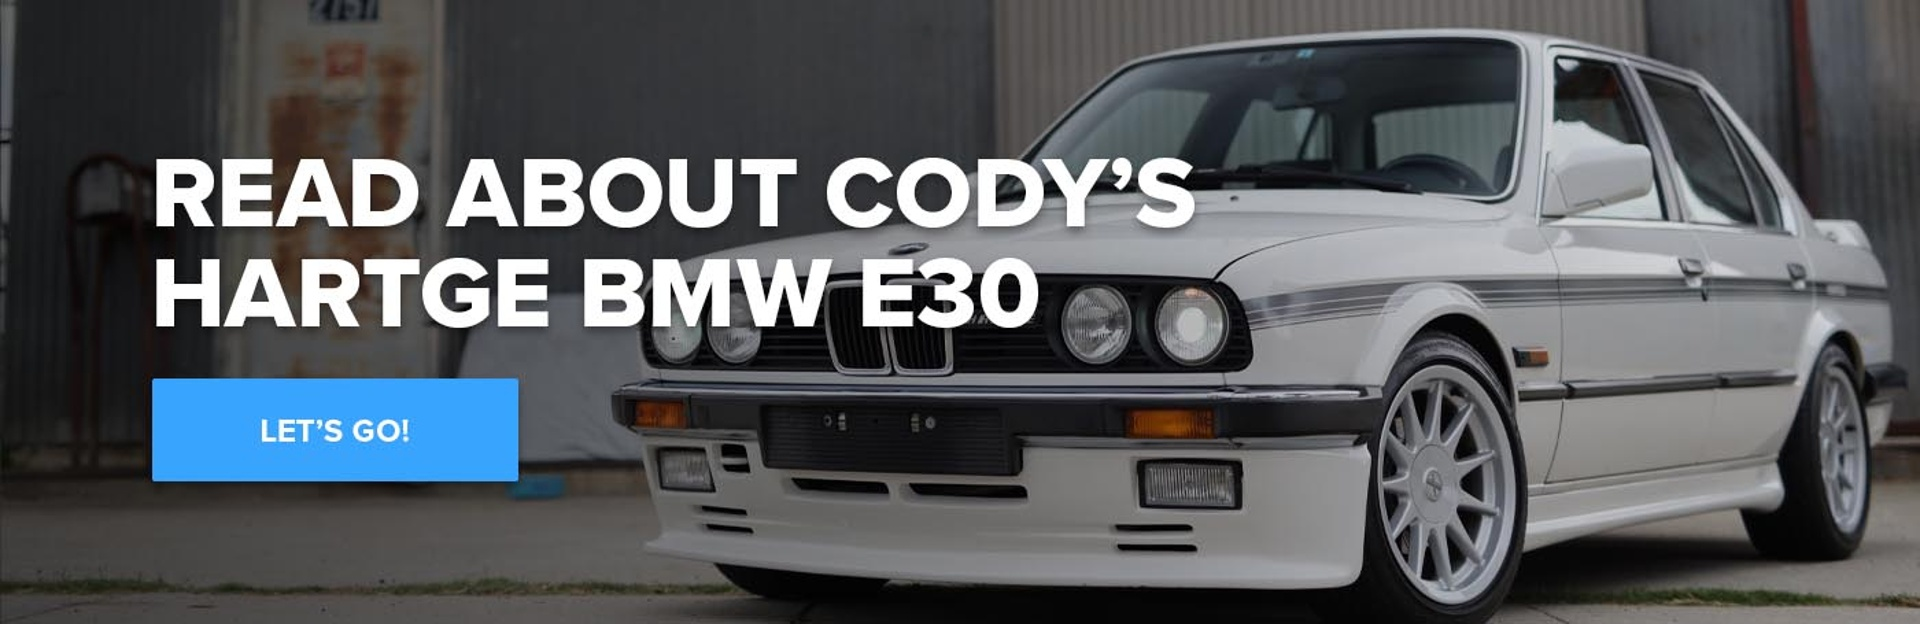 Hartge BMW E30